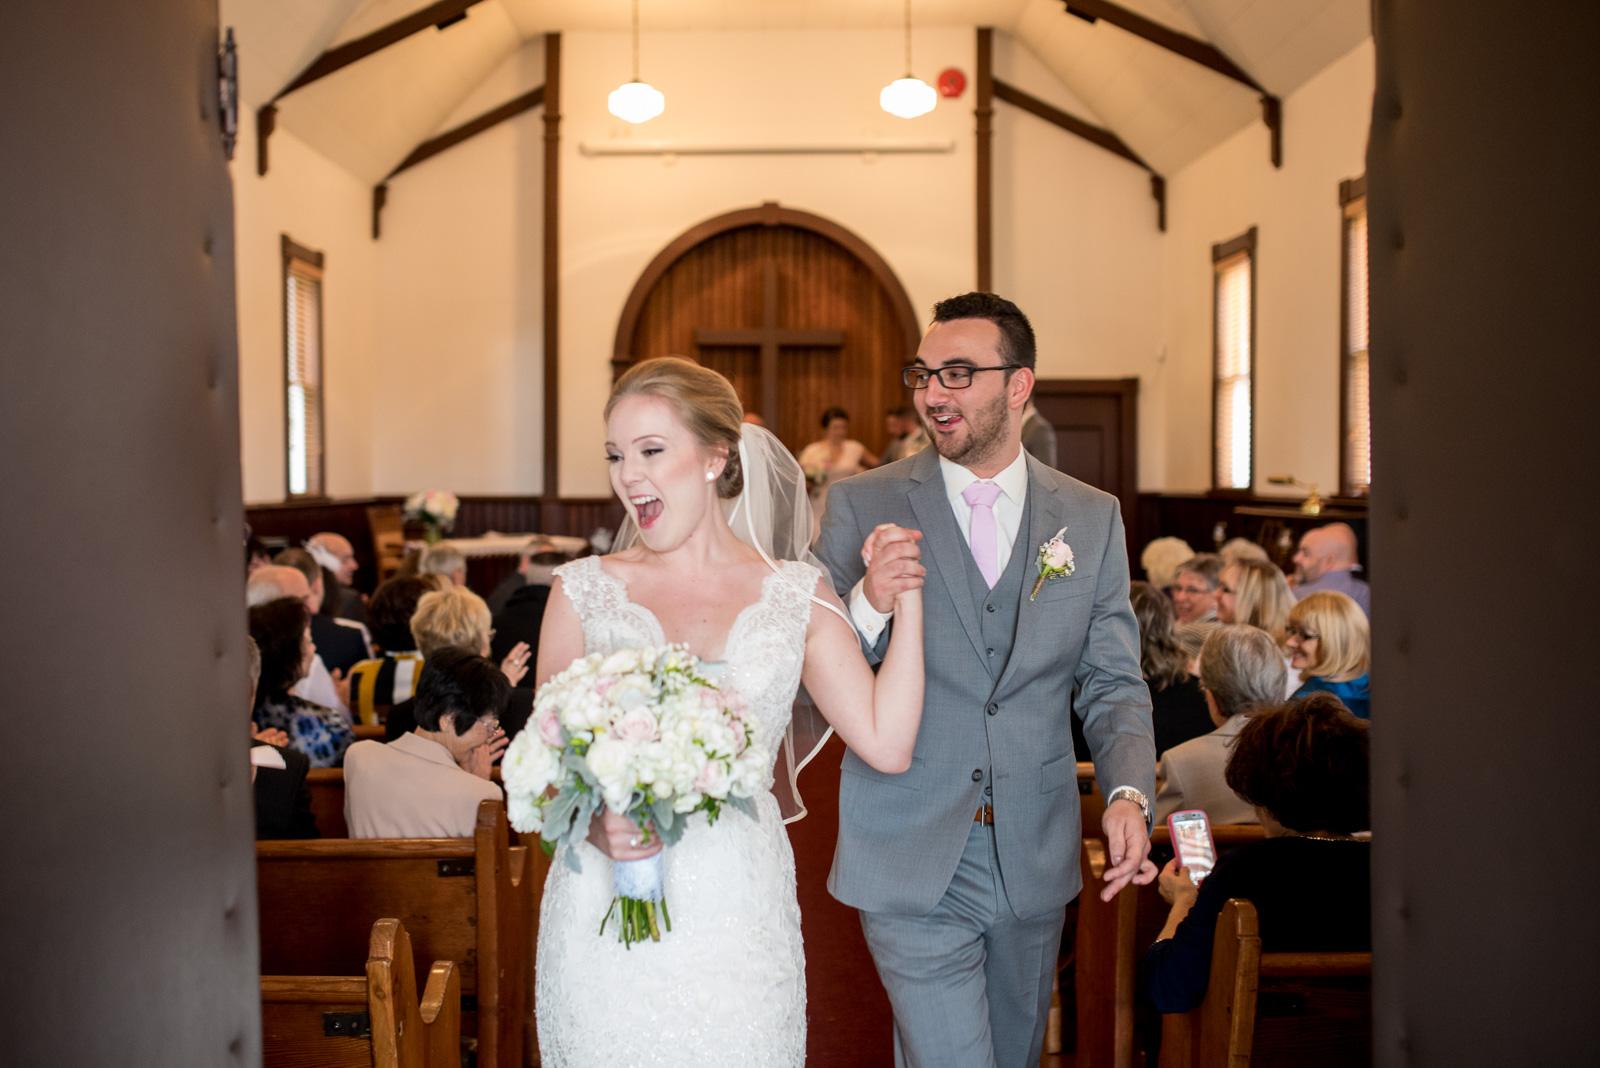 victoria-wedding-photographers-milner-chapel-wedding-centennial-lodge-wedding-17.jpg